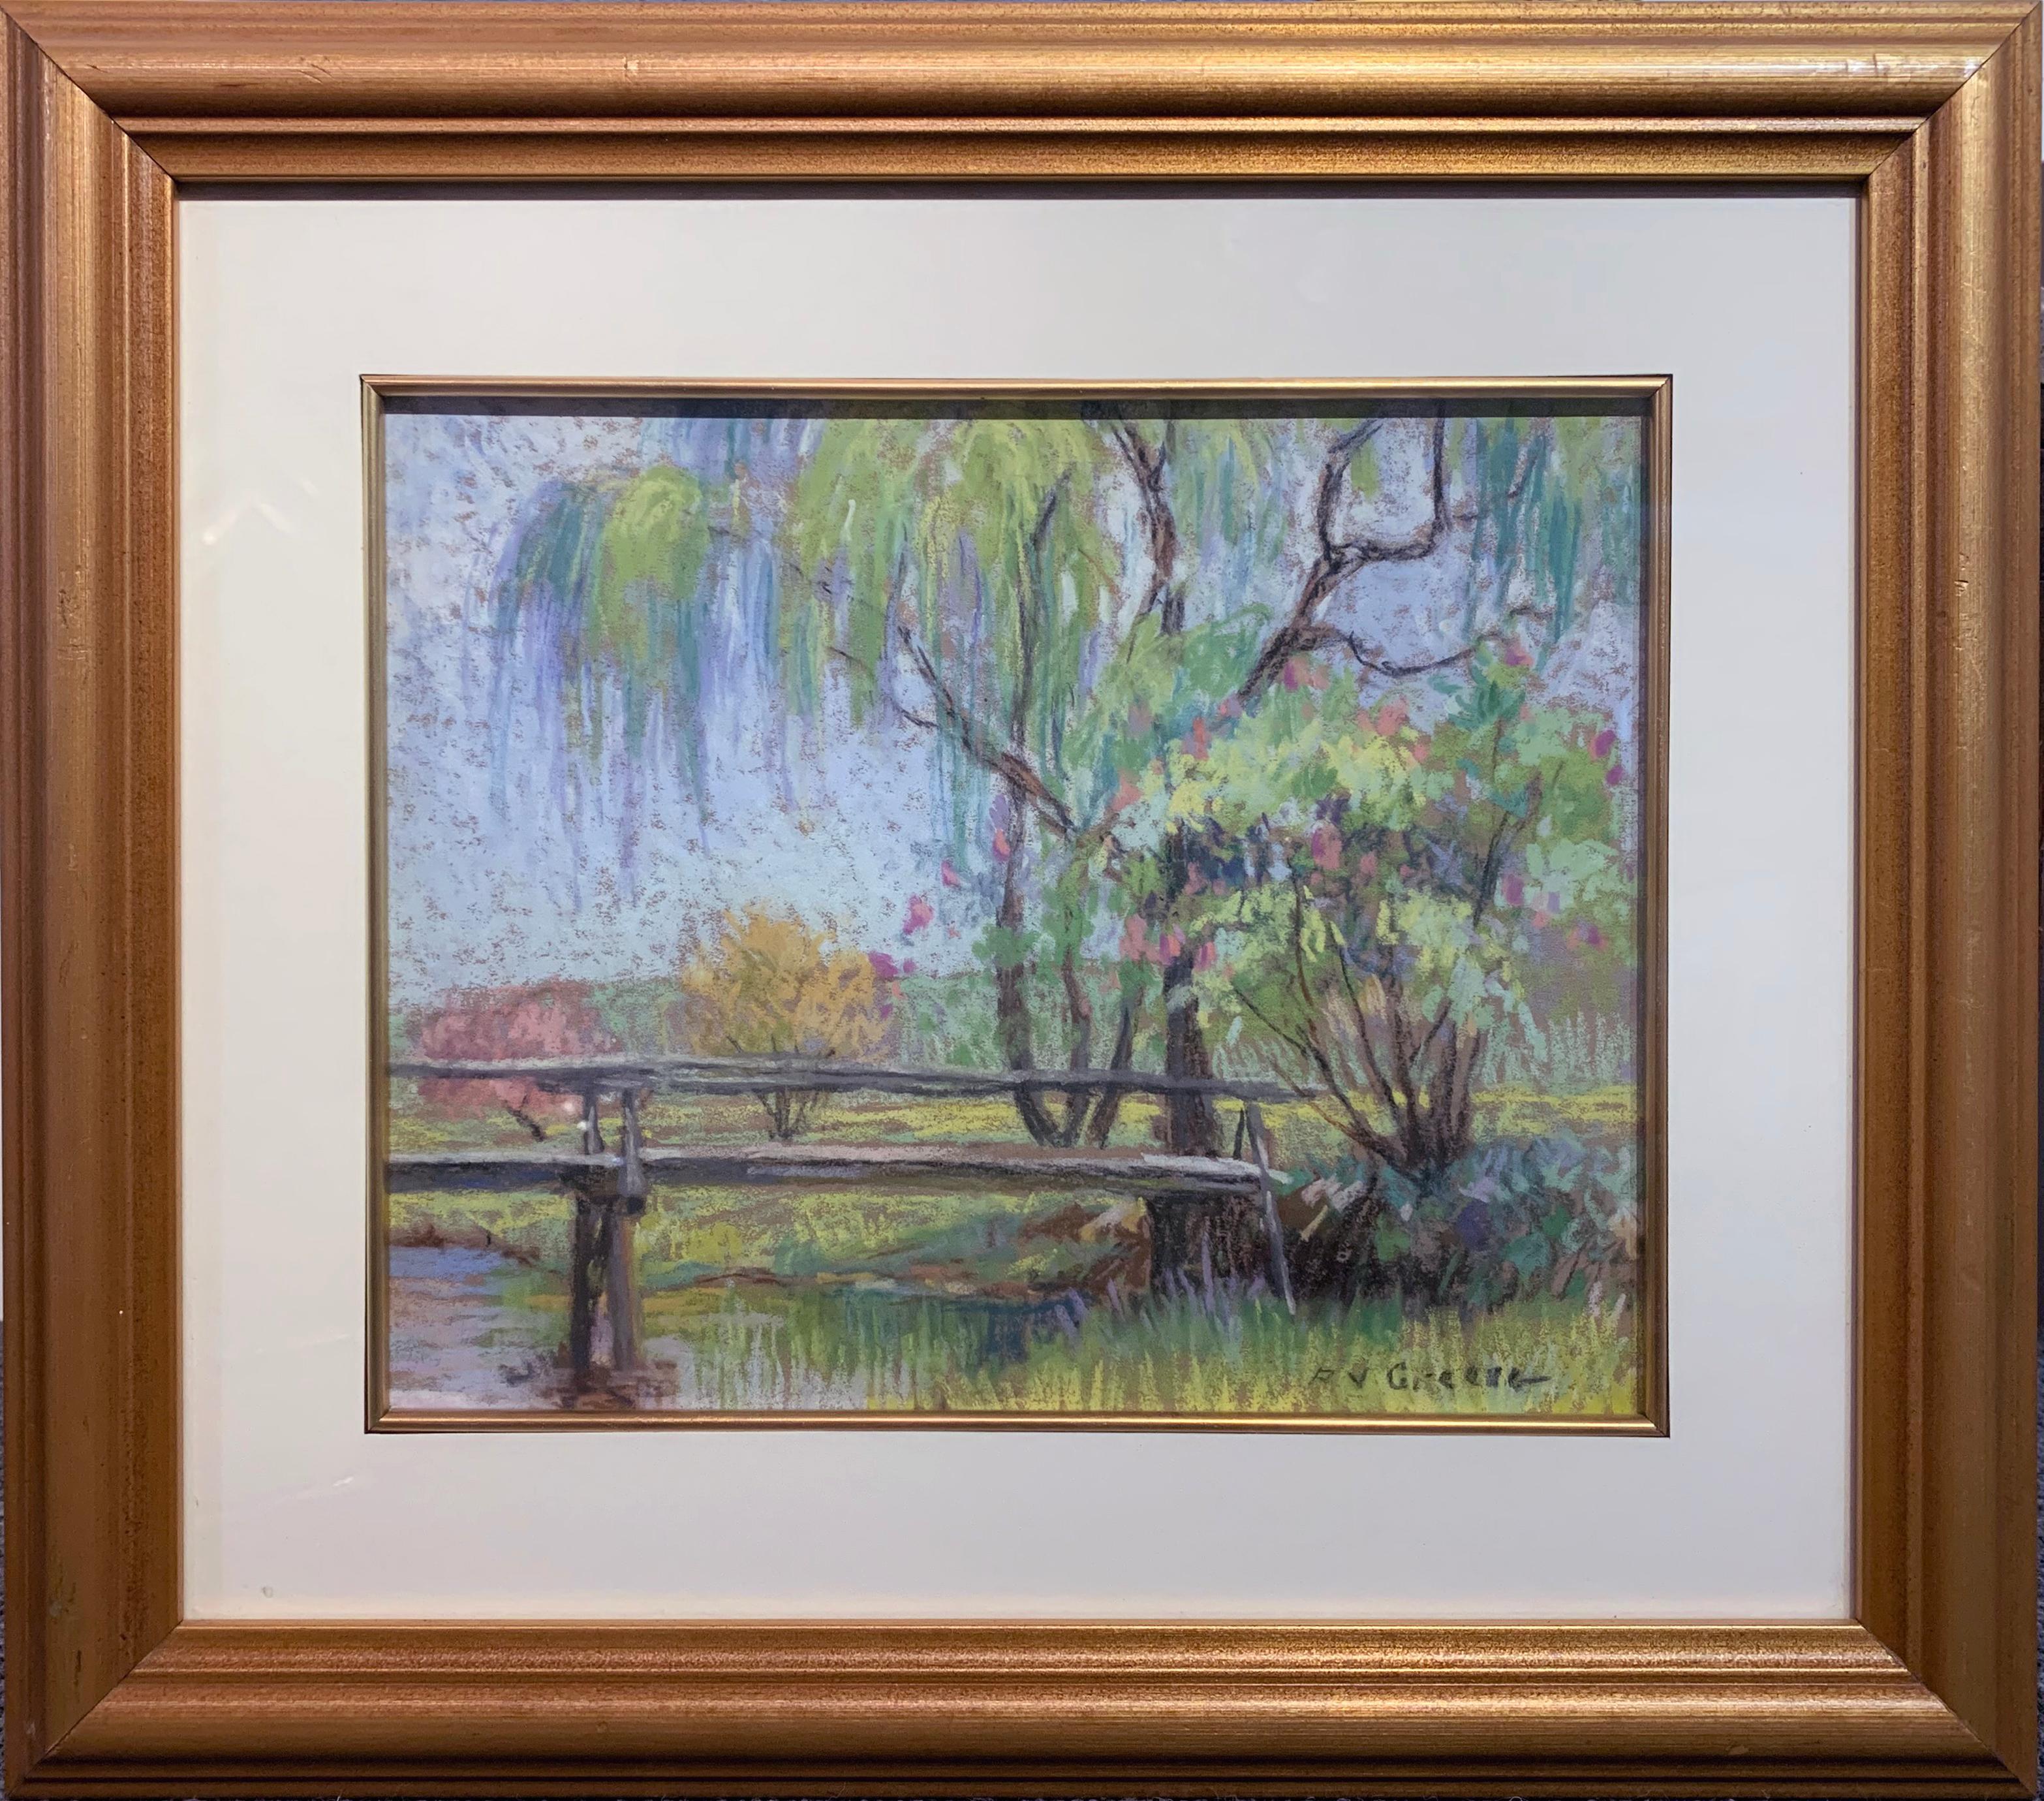 The Bridge, American Impressionist Springtime Landscape, Pastel on Paper